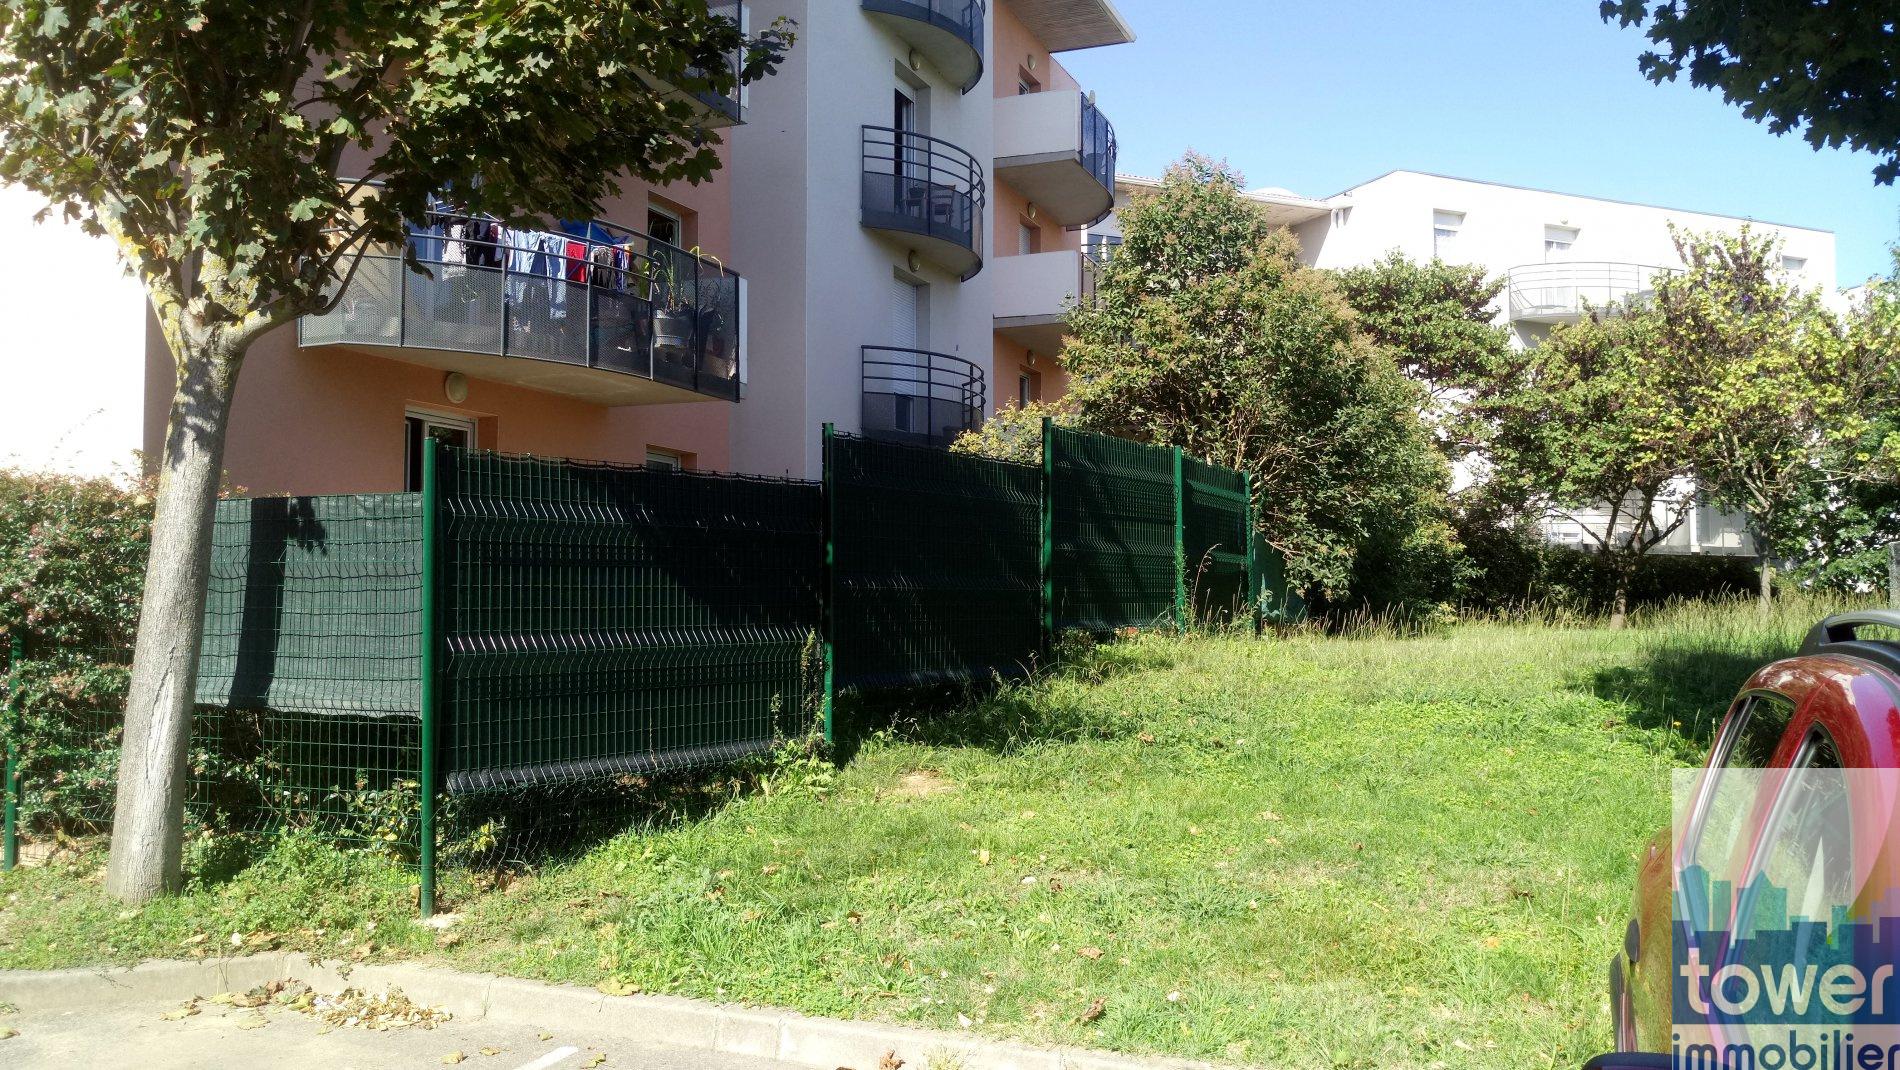 Vente blagnac appartement t1 bis rdc avec jardin for Appartement rdc jardin